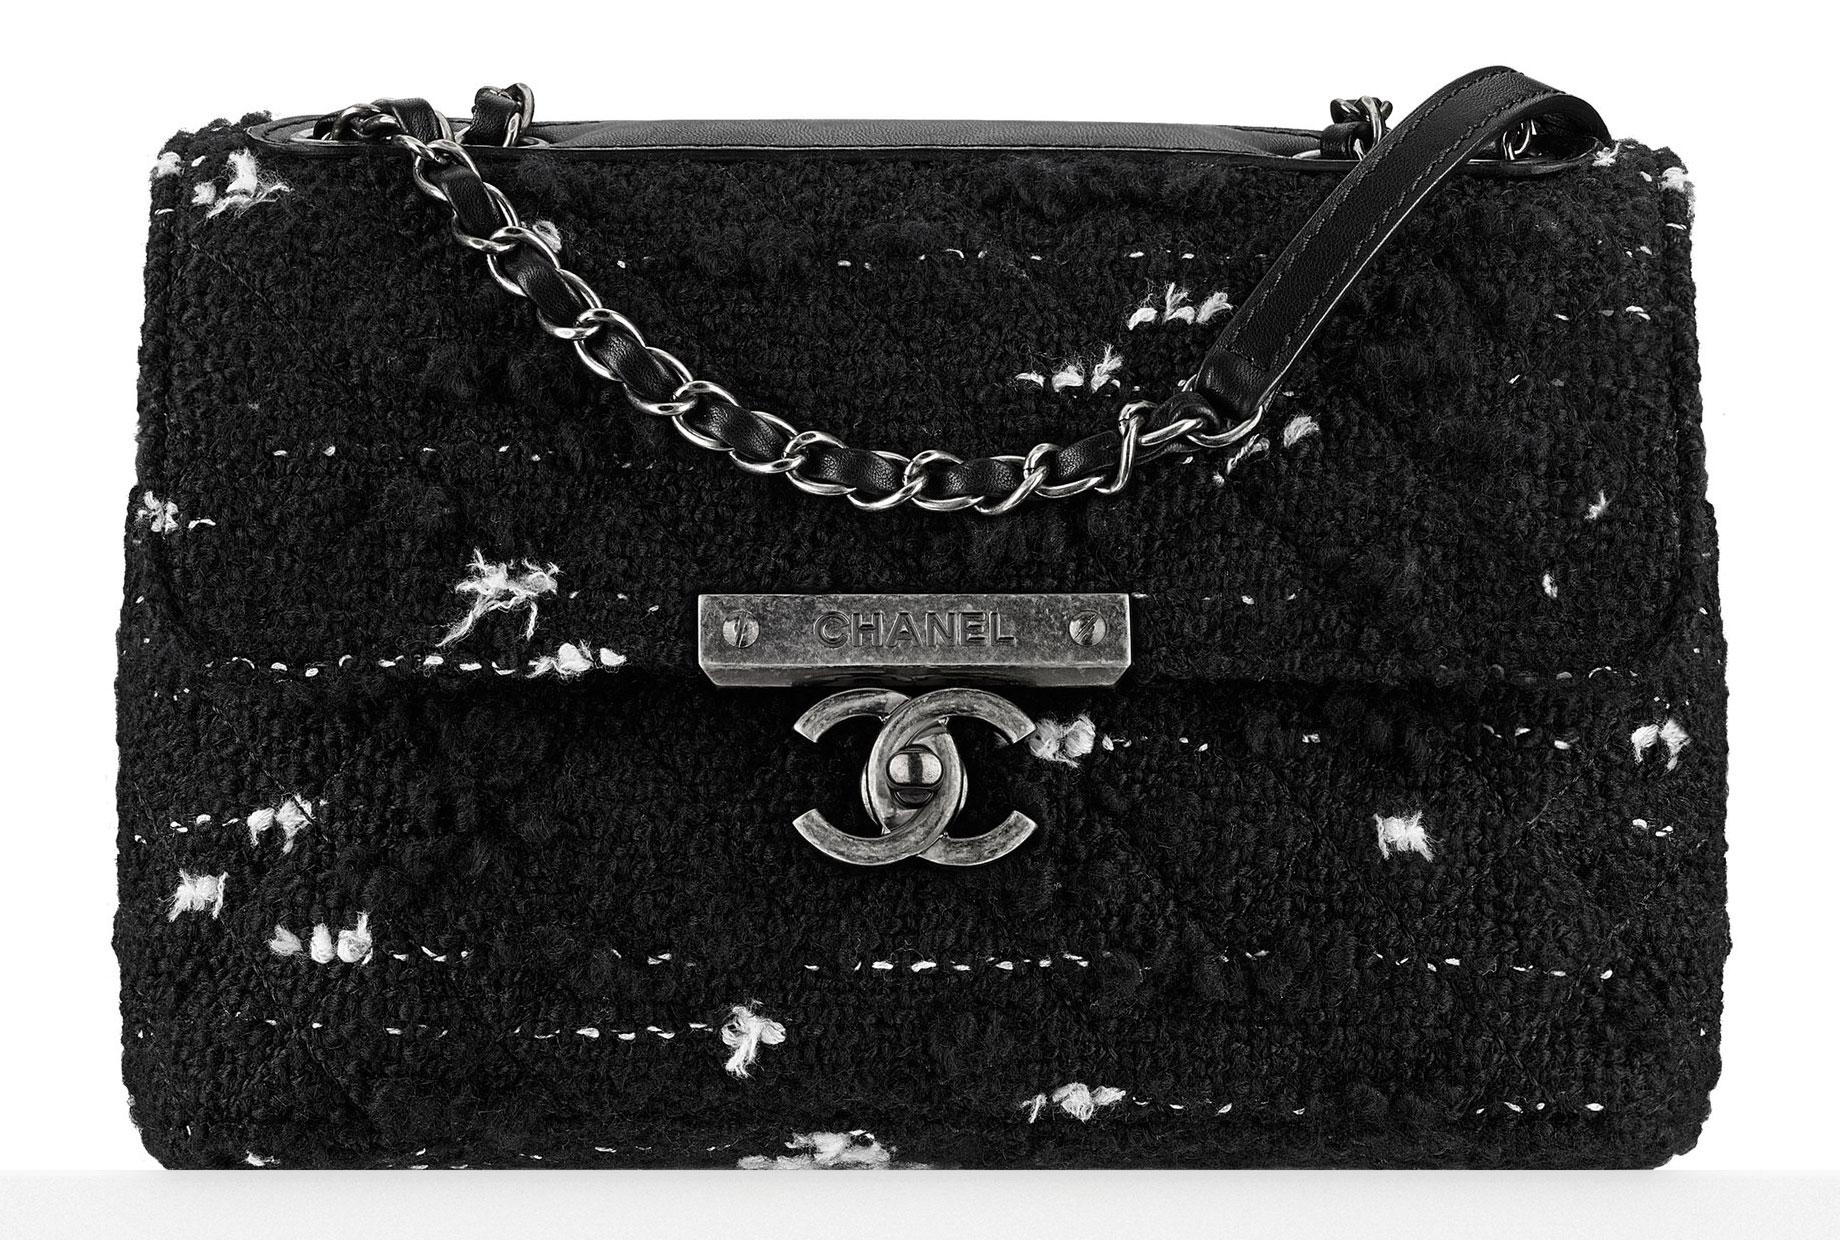 Chanel-Tweed-Flap-Bag-3600